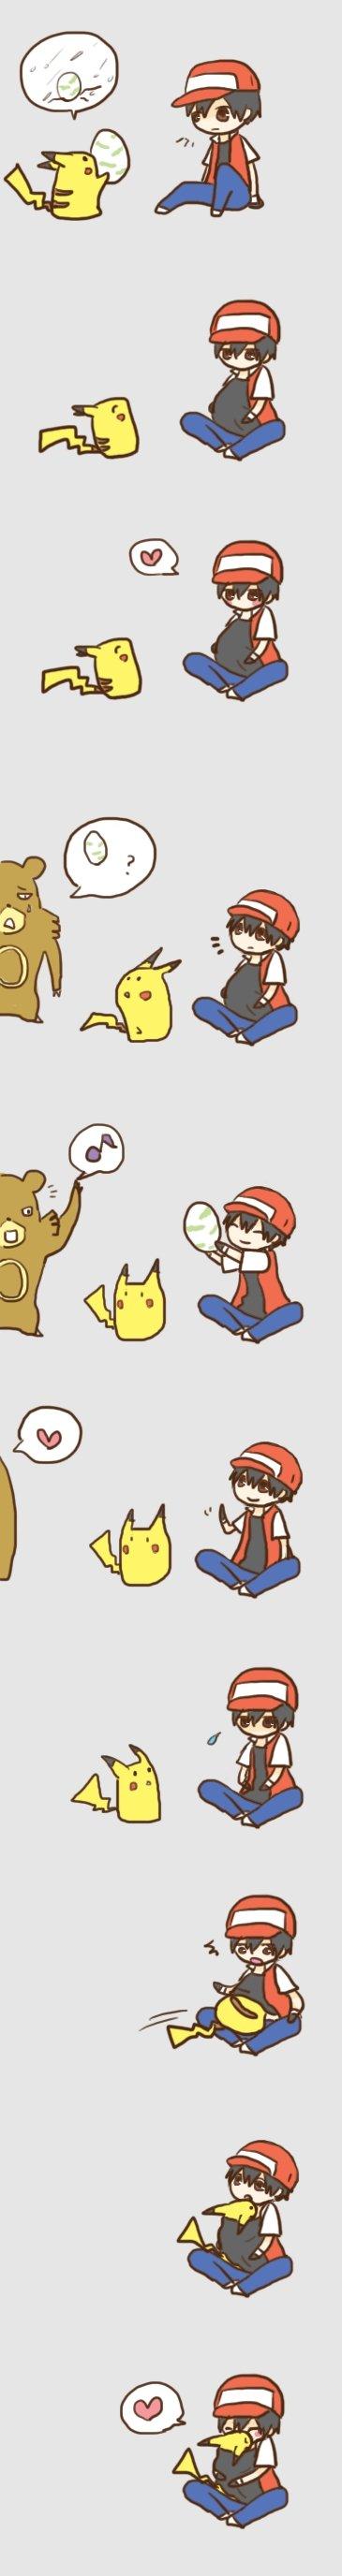 Pokemon Egg Caretaking. /funny_pictures/1116091/Free+Time/. .... Pokemon Egg Caretaking /funny_pictures/1116091/Free+Time/